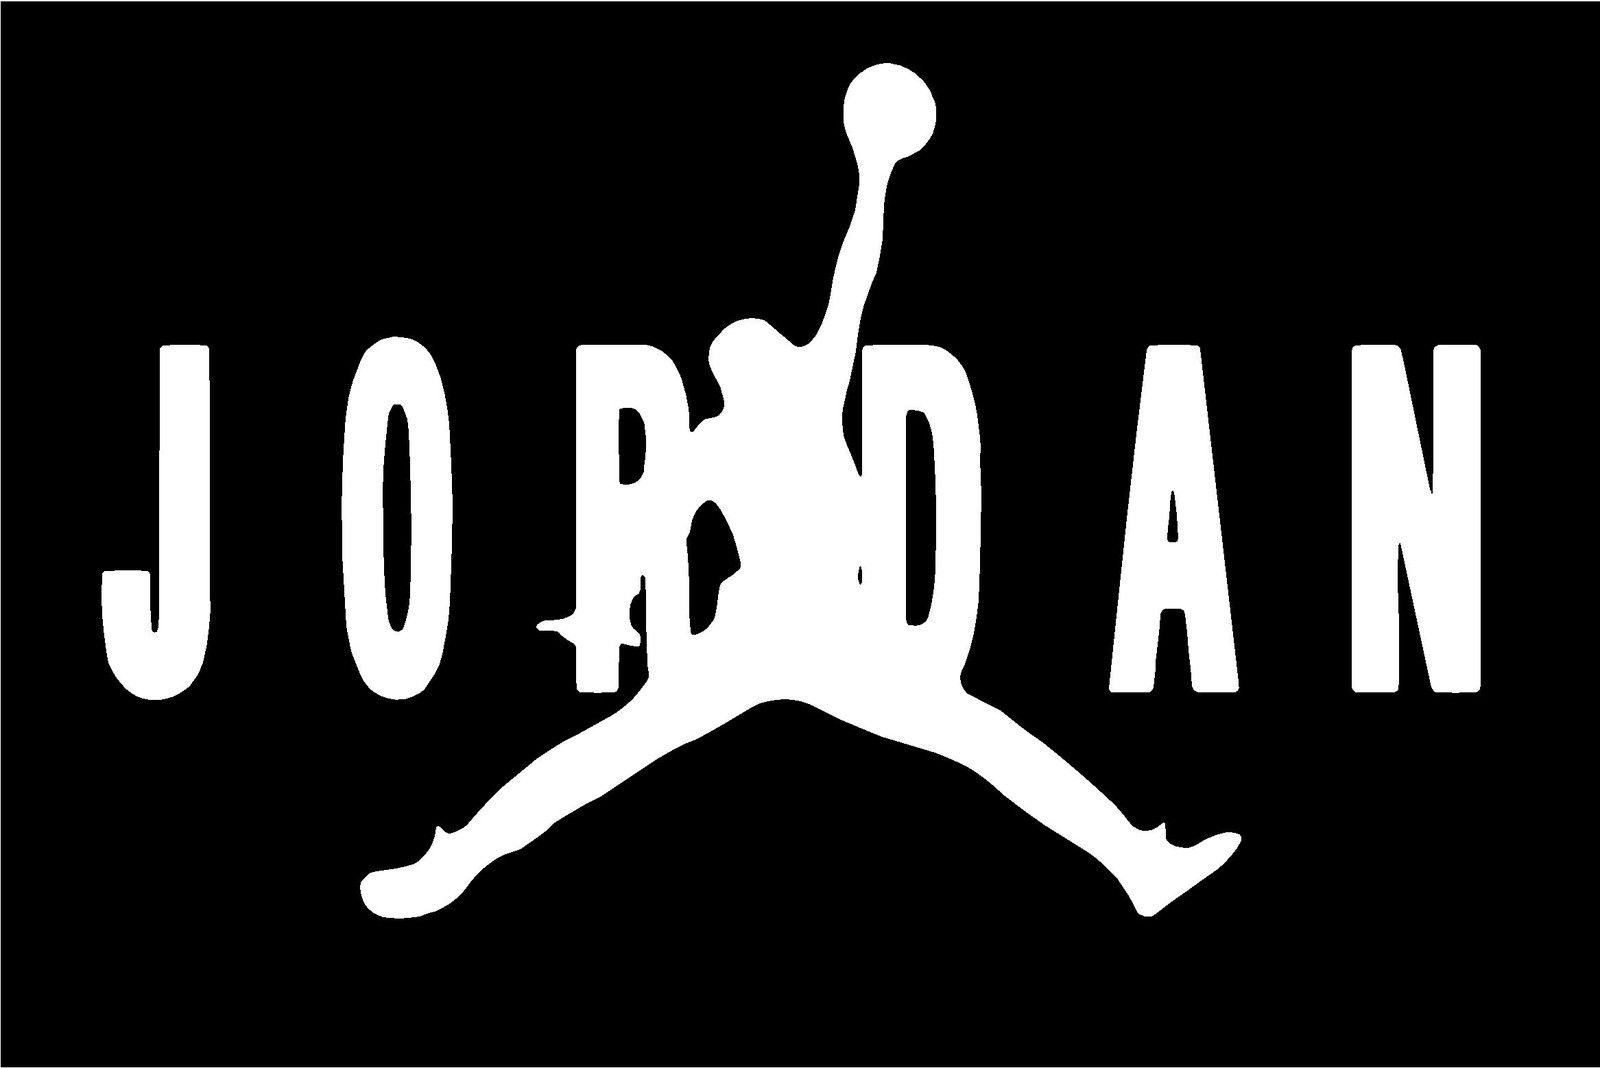 Air jordan logo wallpaper wallpapersafari - Jordan jumpman logo wallpaper ...